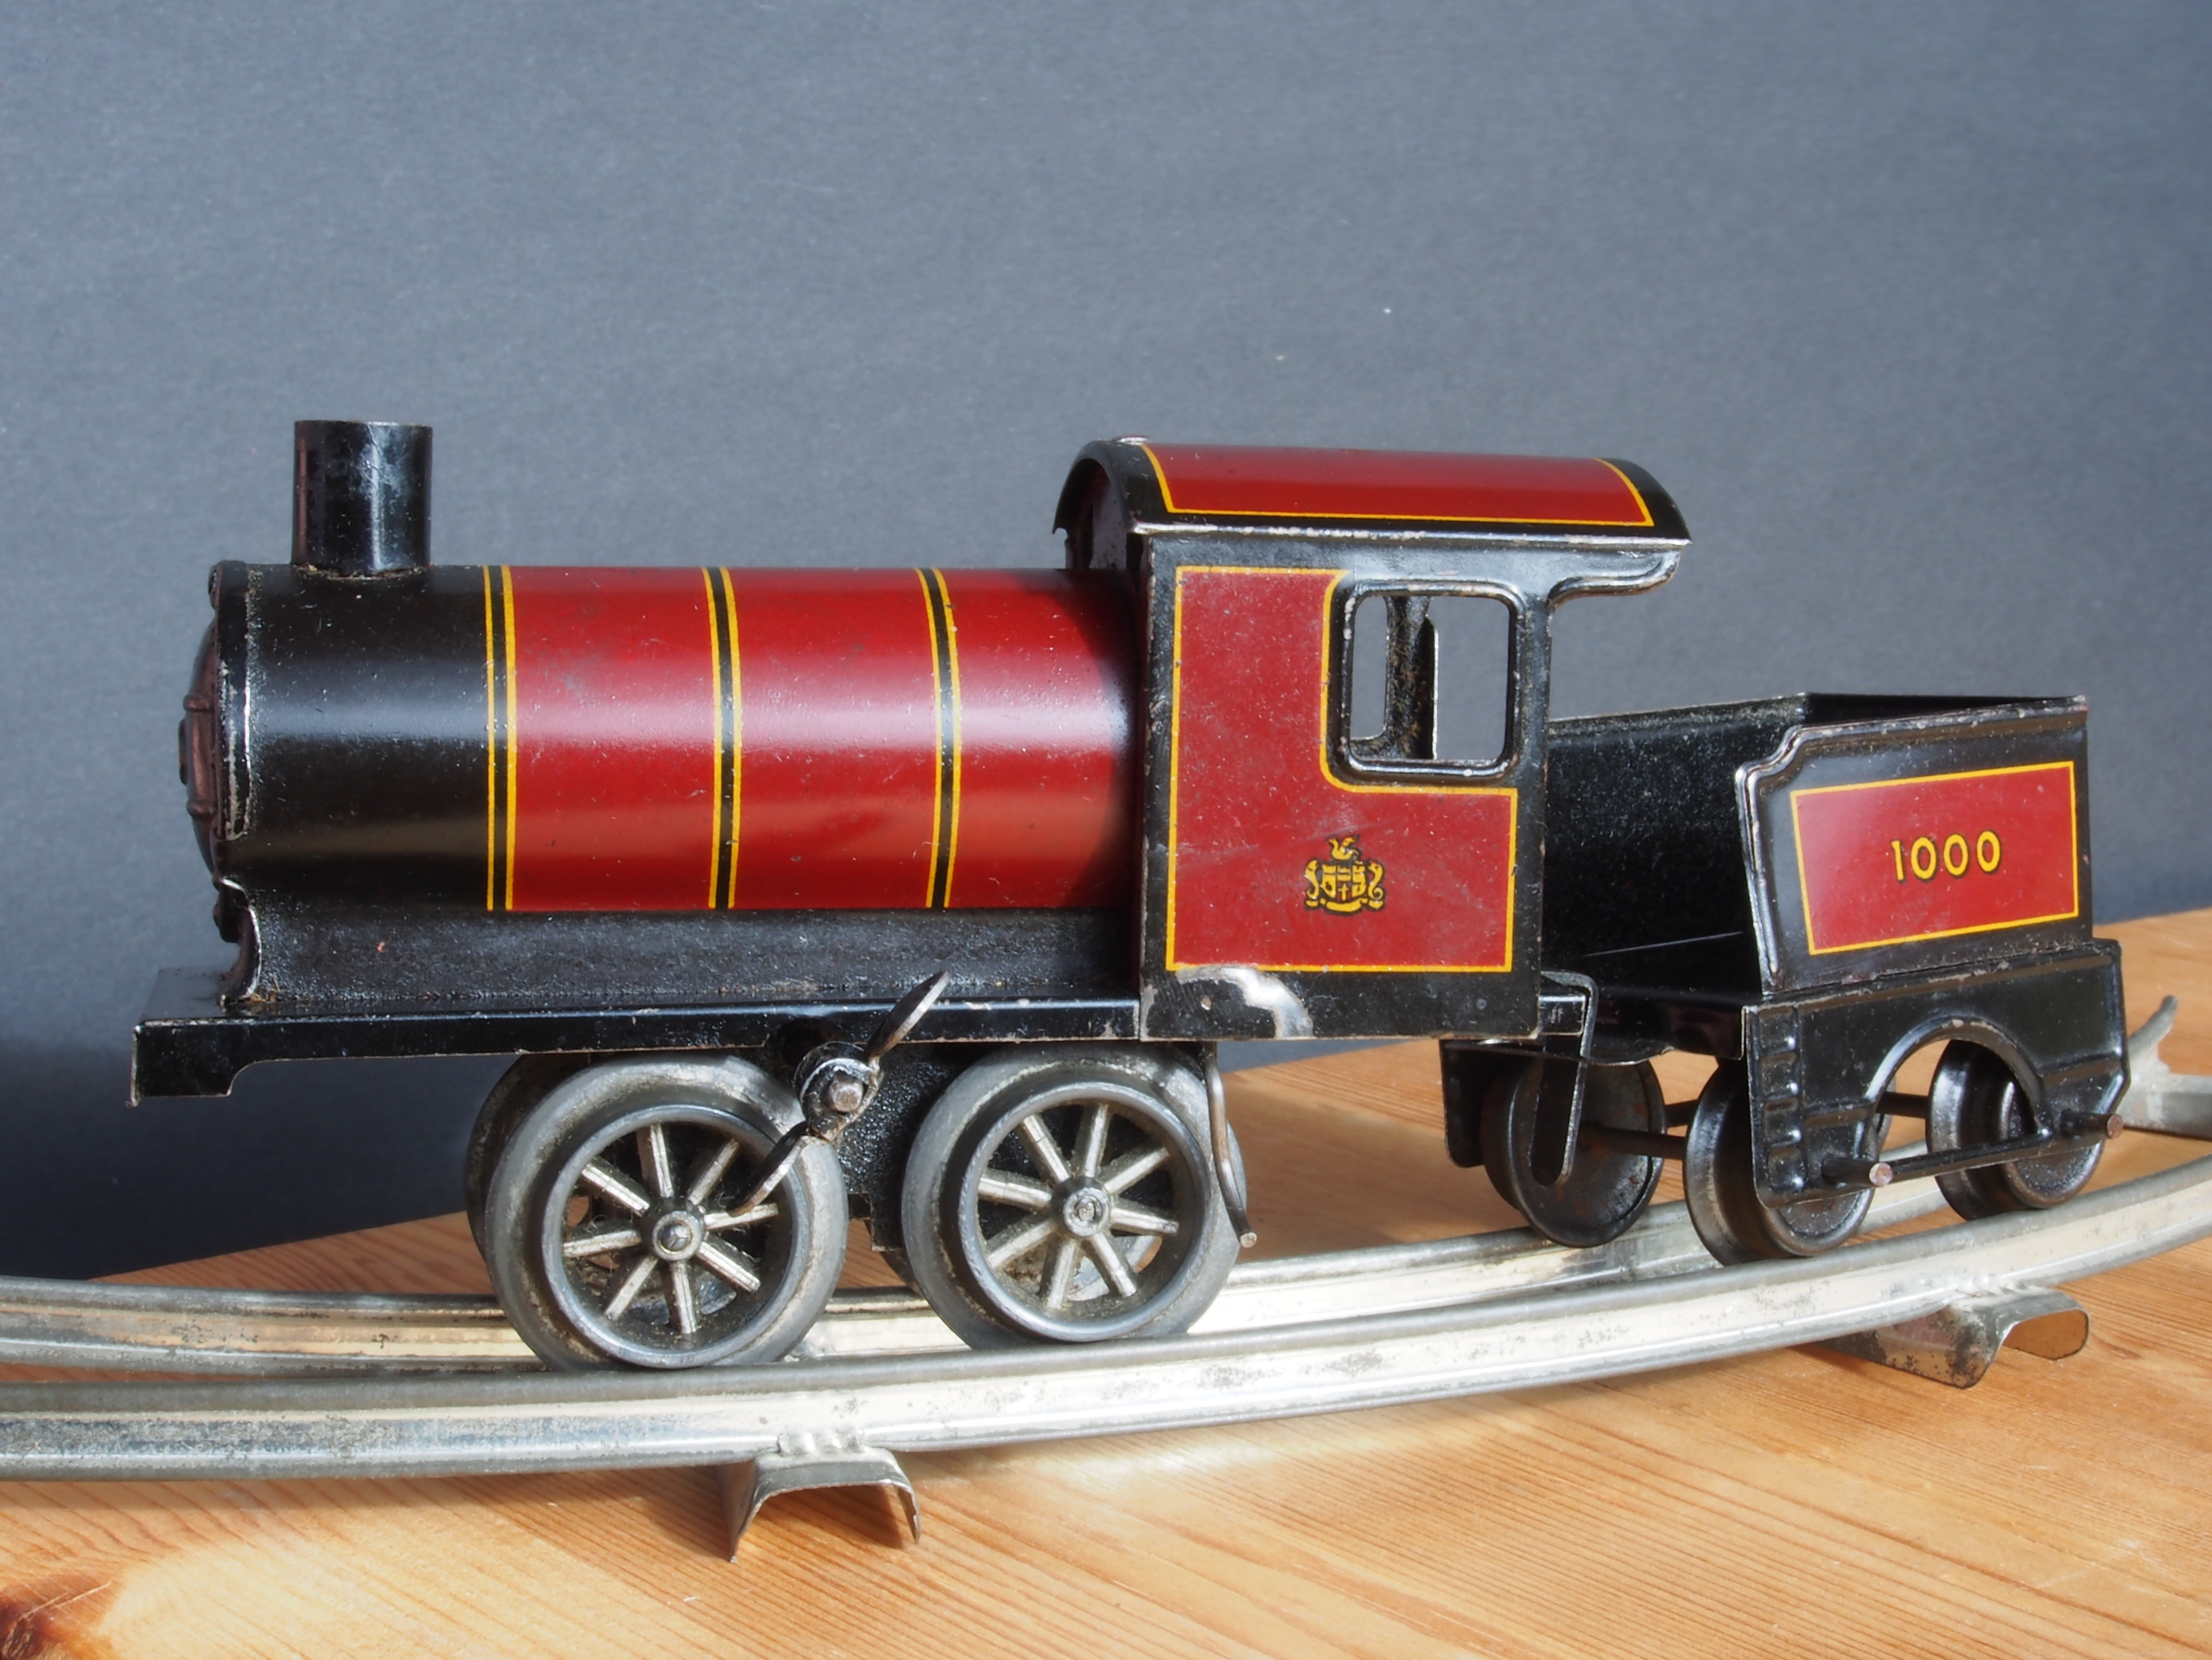 Made in Germany Tin clockwork toy train from around 1900 pic 001 4157x3120 - Er du eller dit barn vild med modeltog?